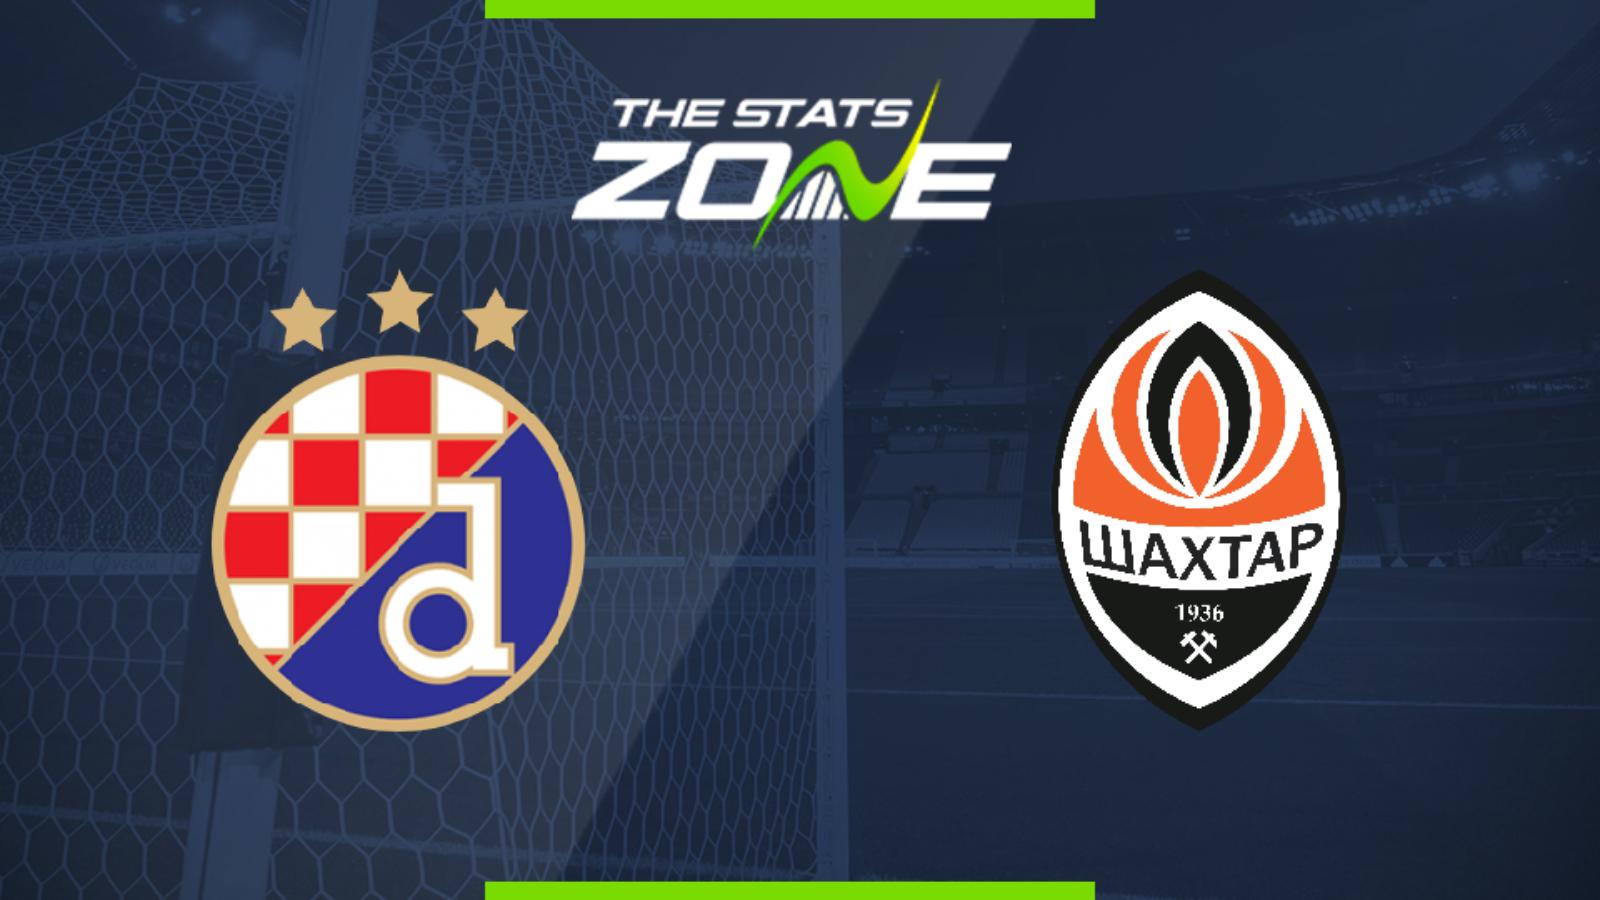 2019 20 Uefa Champions League Dinamo Zagreb Vs Shakhtar Donetsk Preview Prediction The Stats Zone